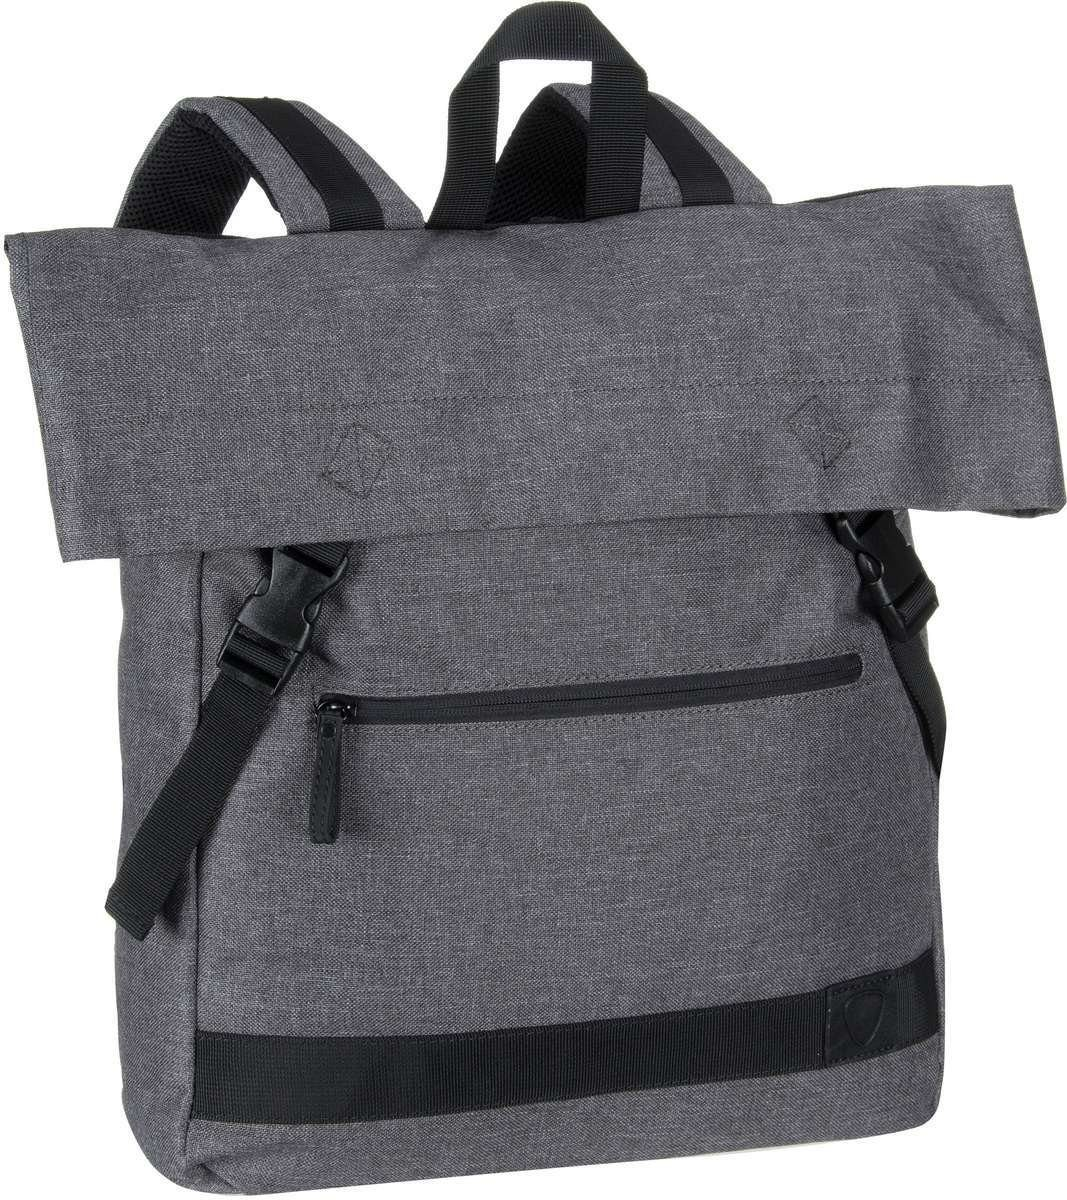 Strellson Rucksack / Daypack »Northwood Backpack LVF«